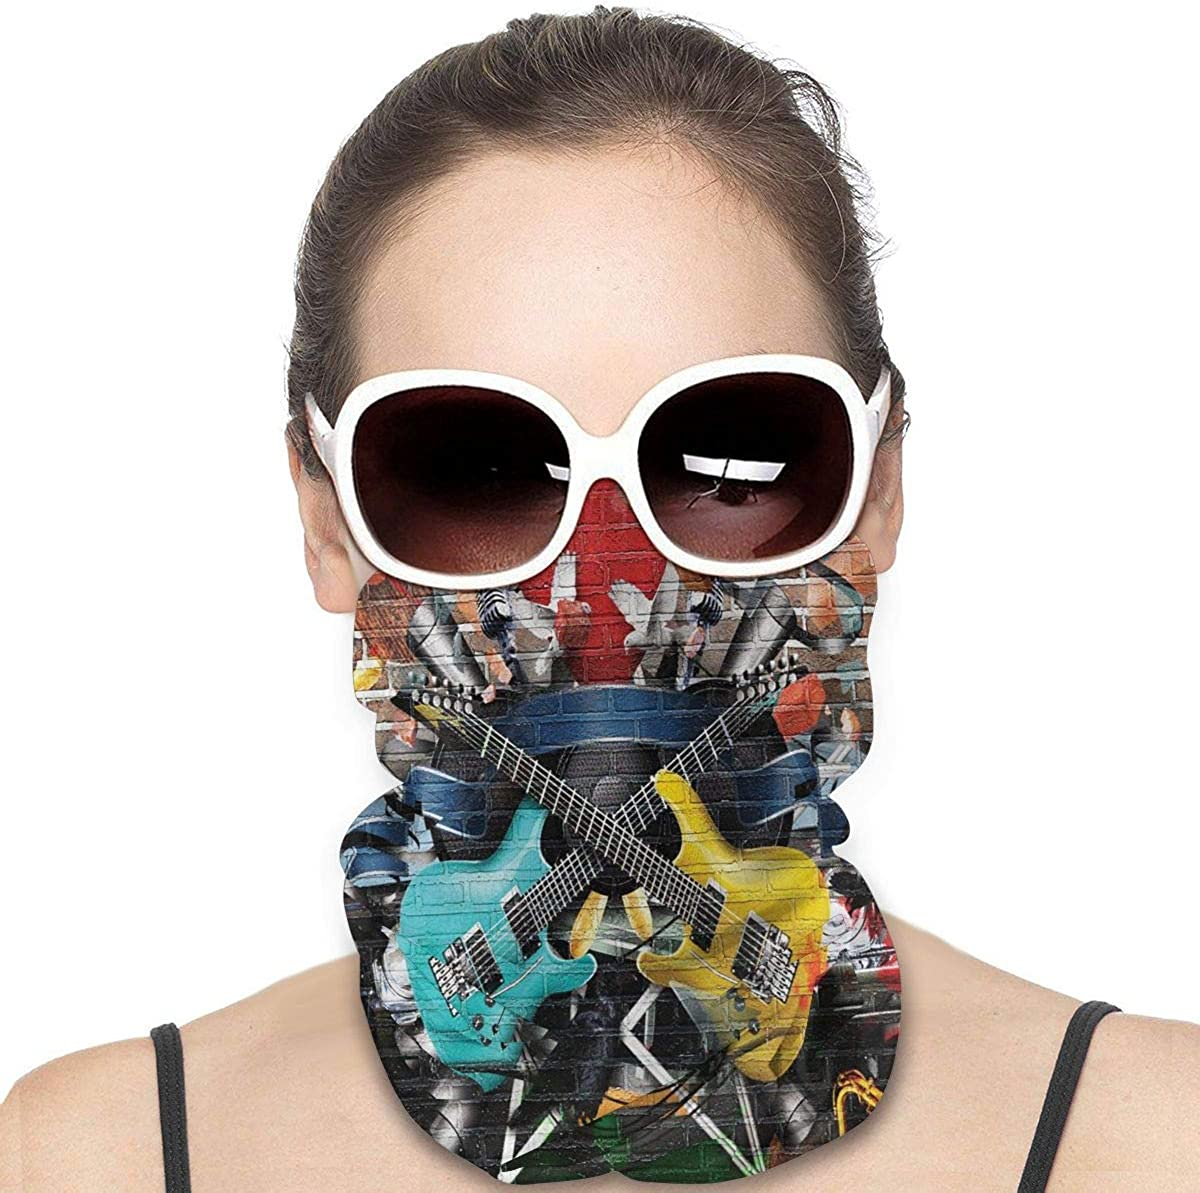 Tidyki Motorcycle Masks for Men - Guitar Graffiti Music Street Wall Art Motorcycle Mask Bandana Face Mask Multifunctional Headwear Head Bands Neck Warmer Men Headwear Sun Mask